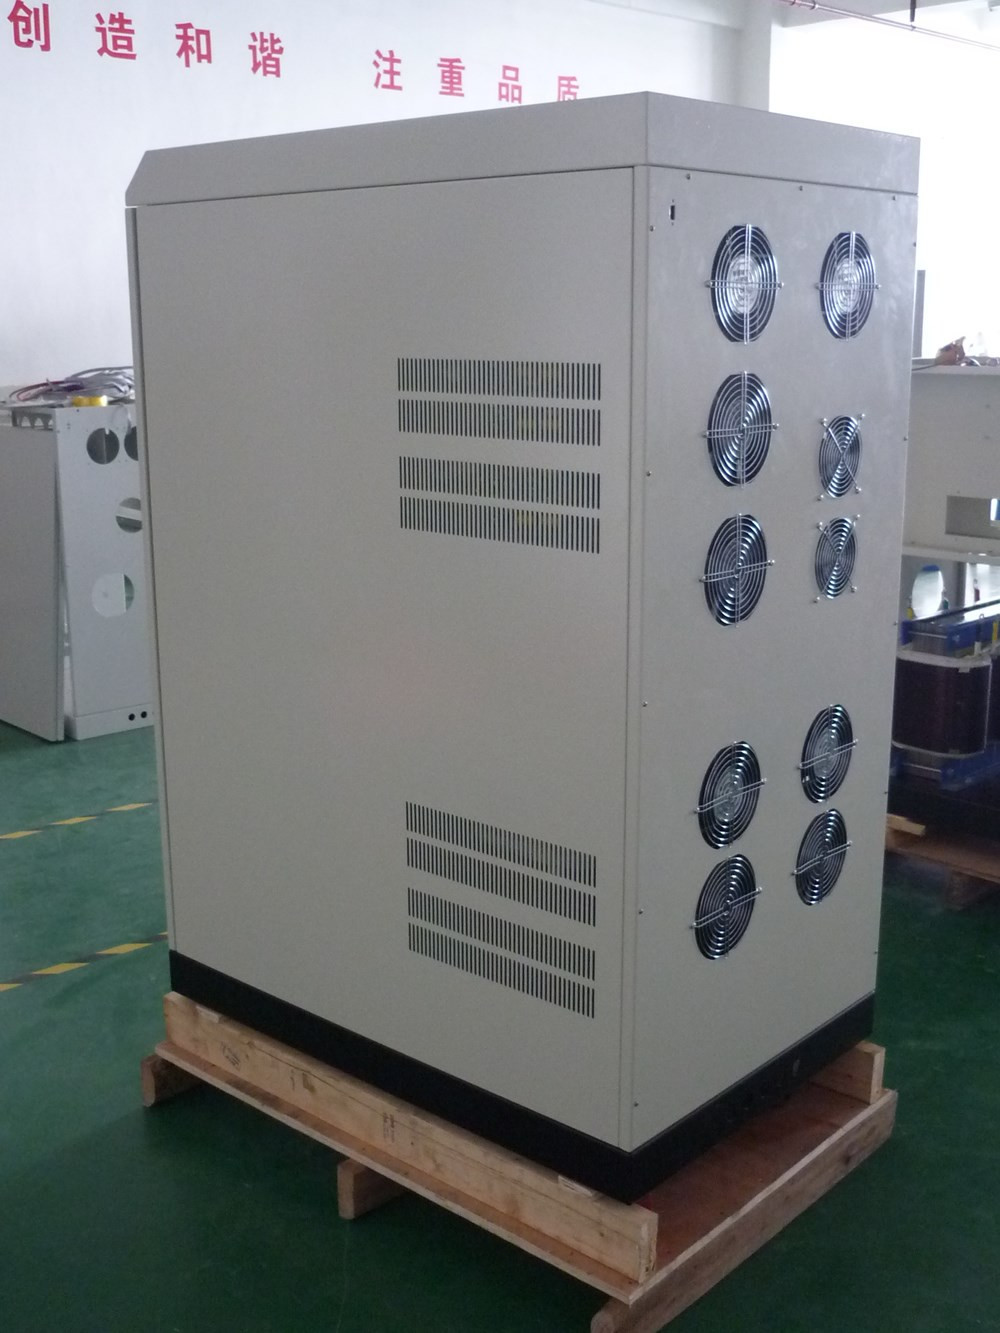 Bosin 计算机系统 ups不间断电源6KW蓄电池